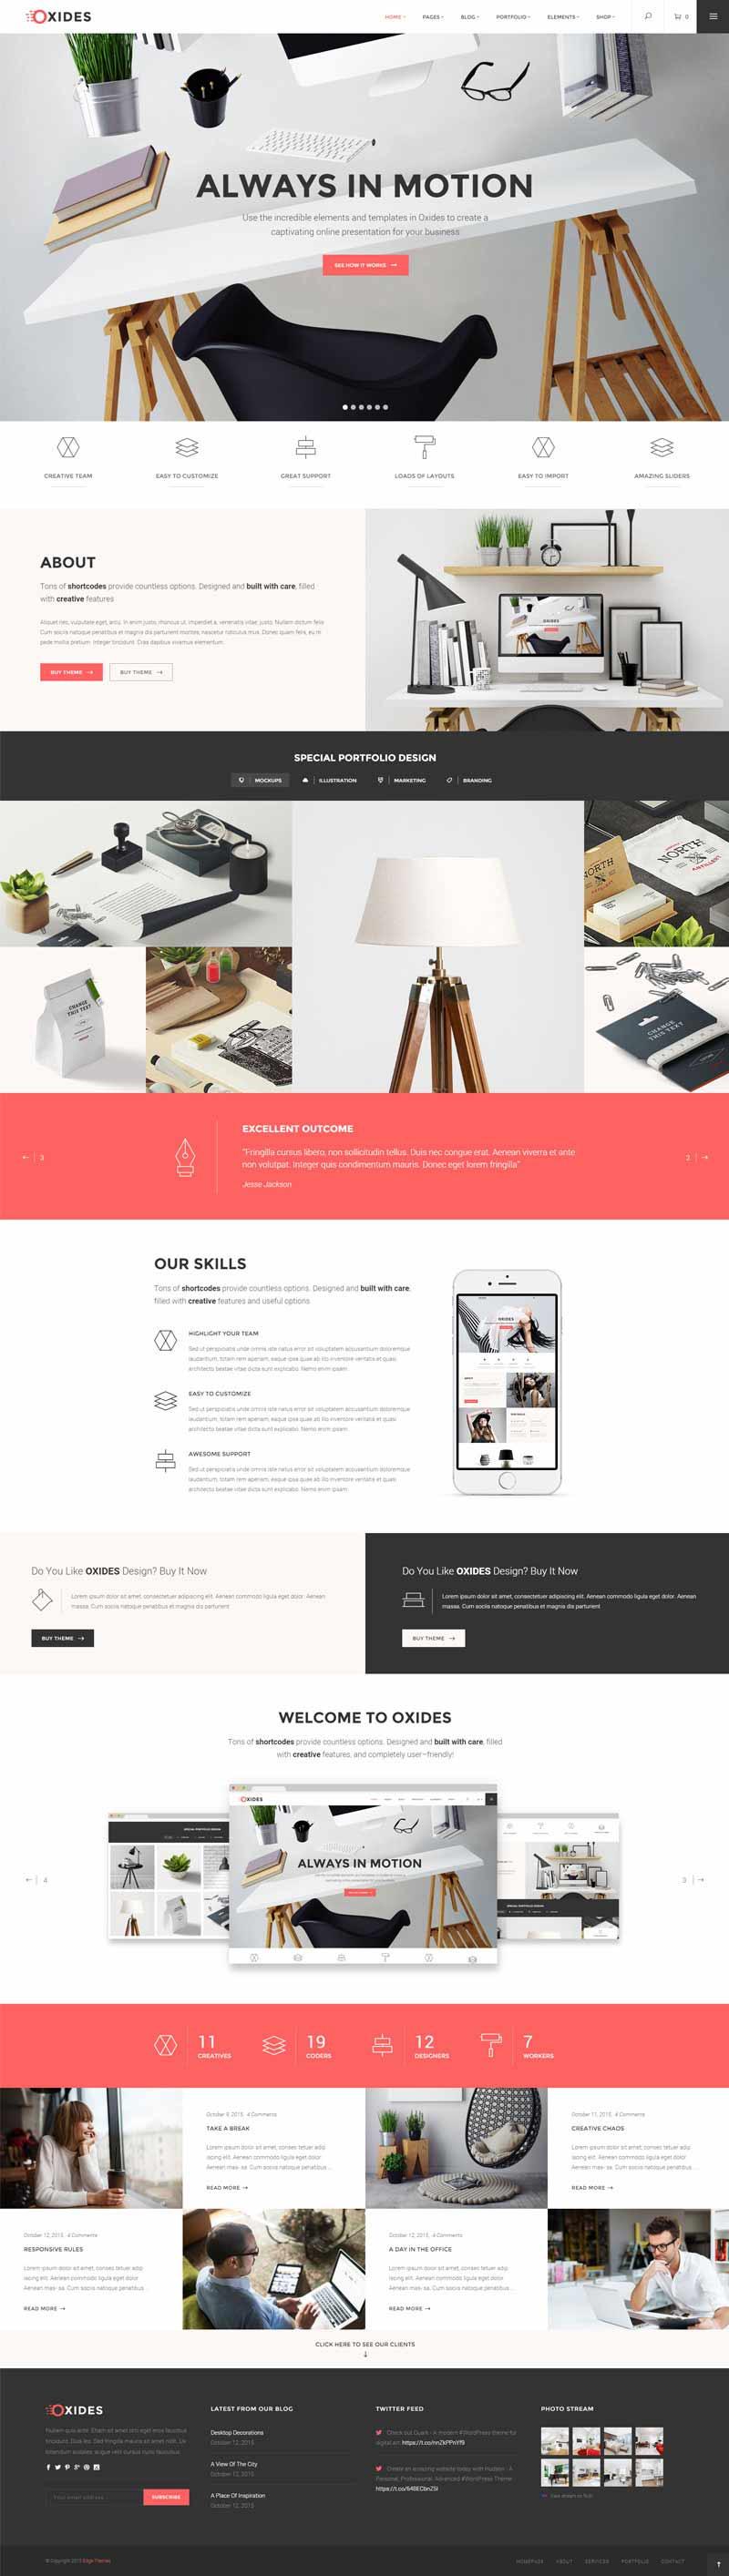 Oxides—A-Creative-Studio-Theme-for-Entrepreneurs